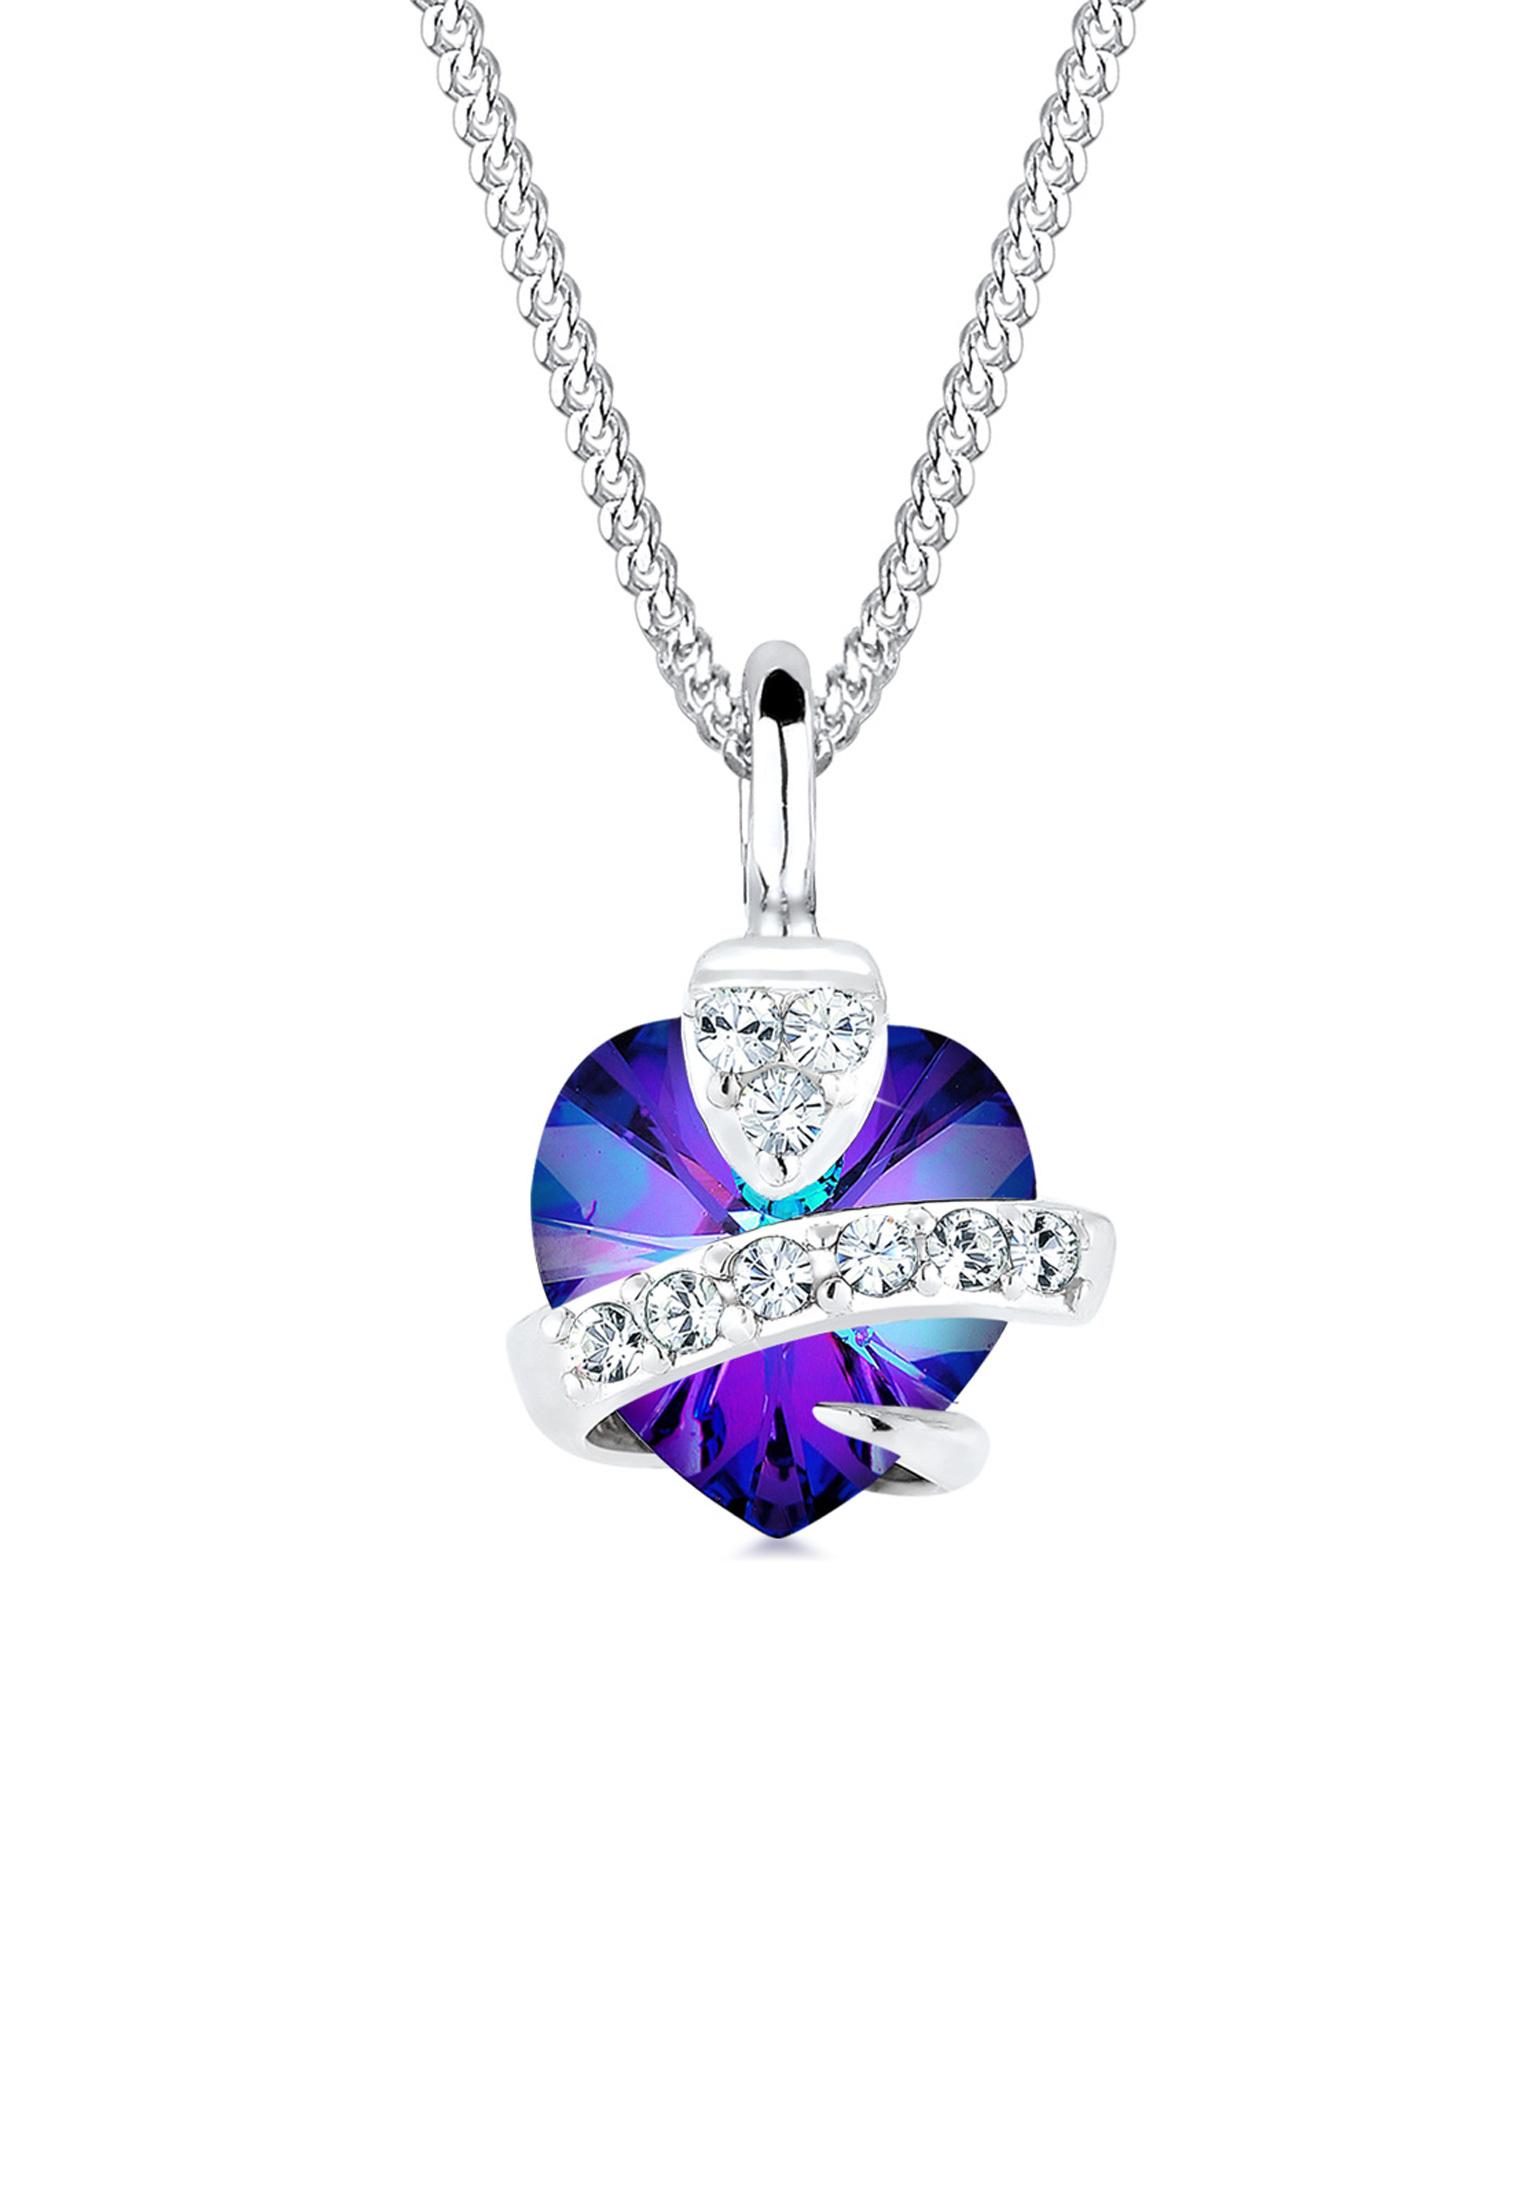 Halskette Herz | Kristall ( Blau ) | 925er Sterling Silber